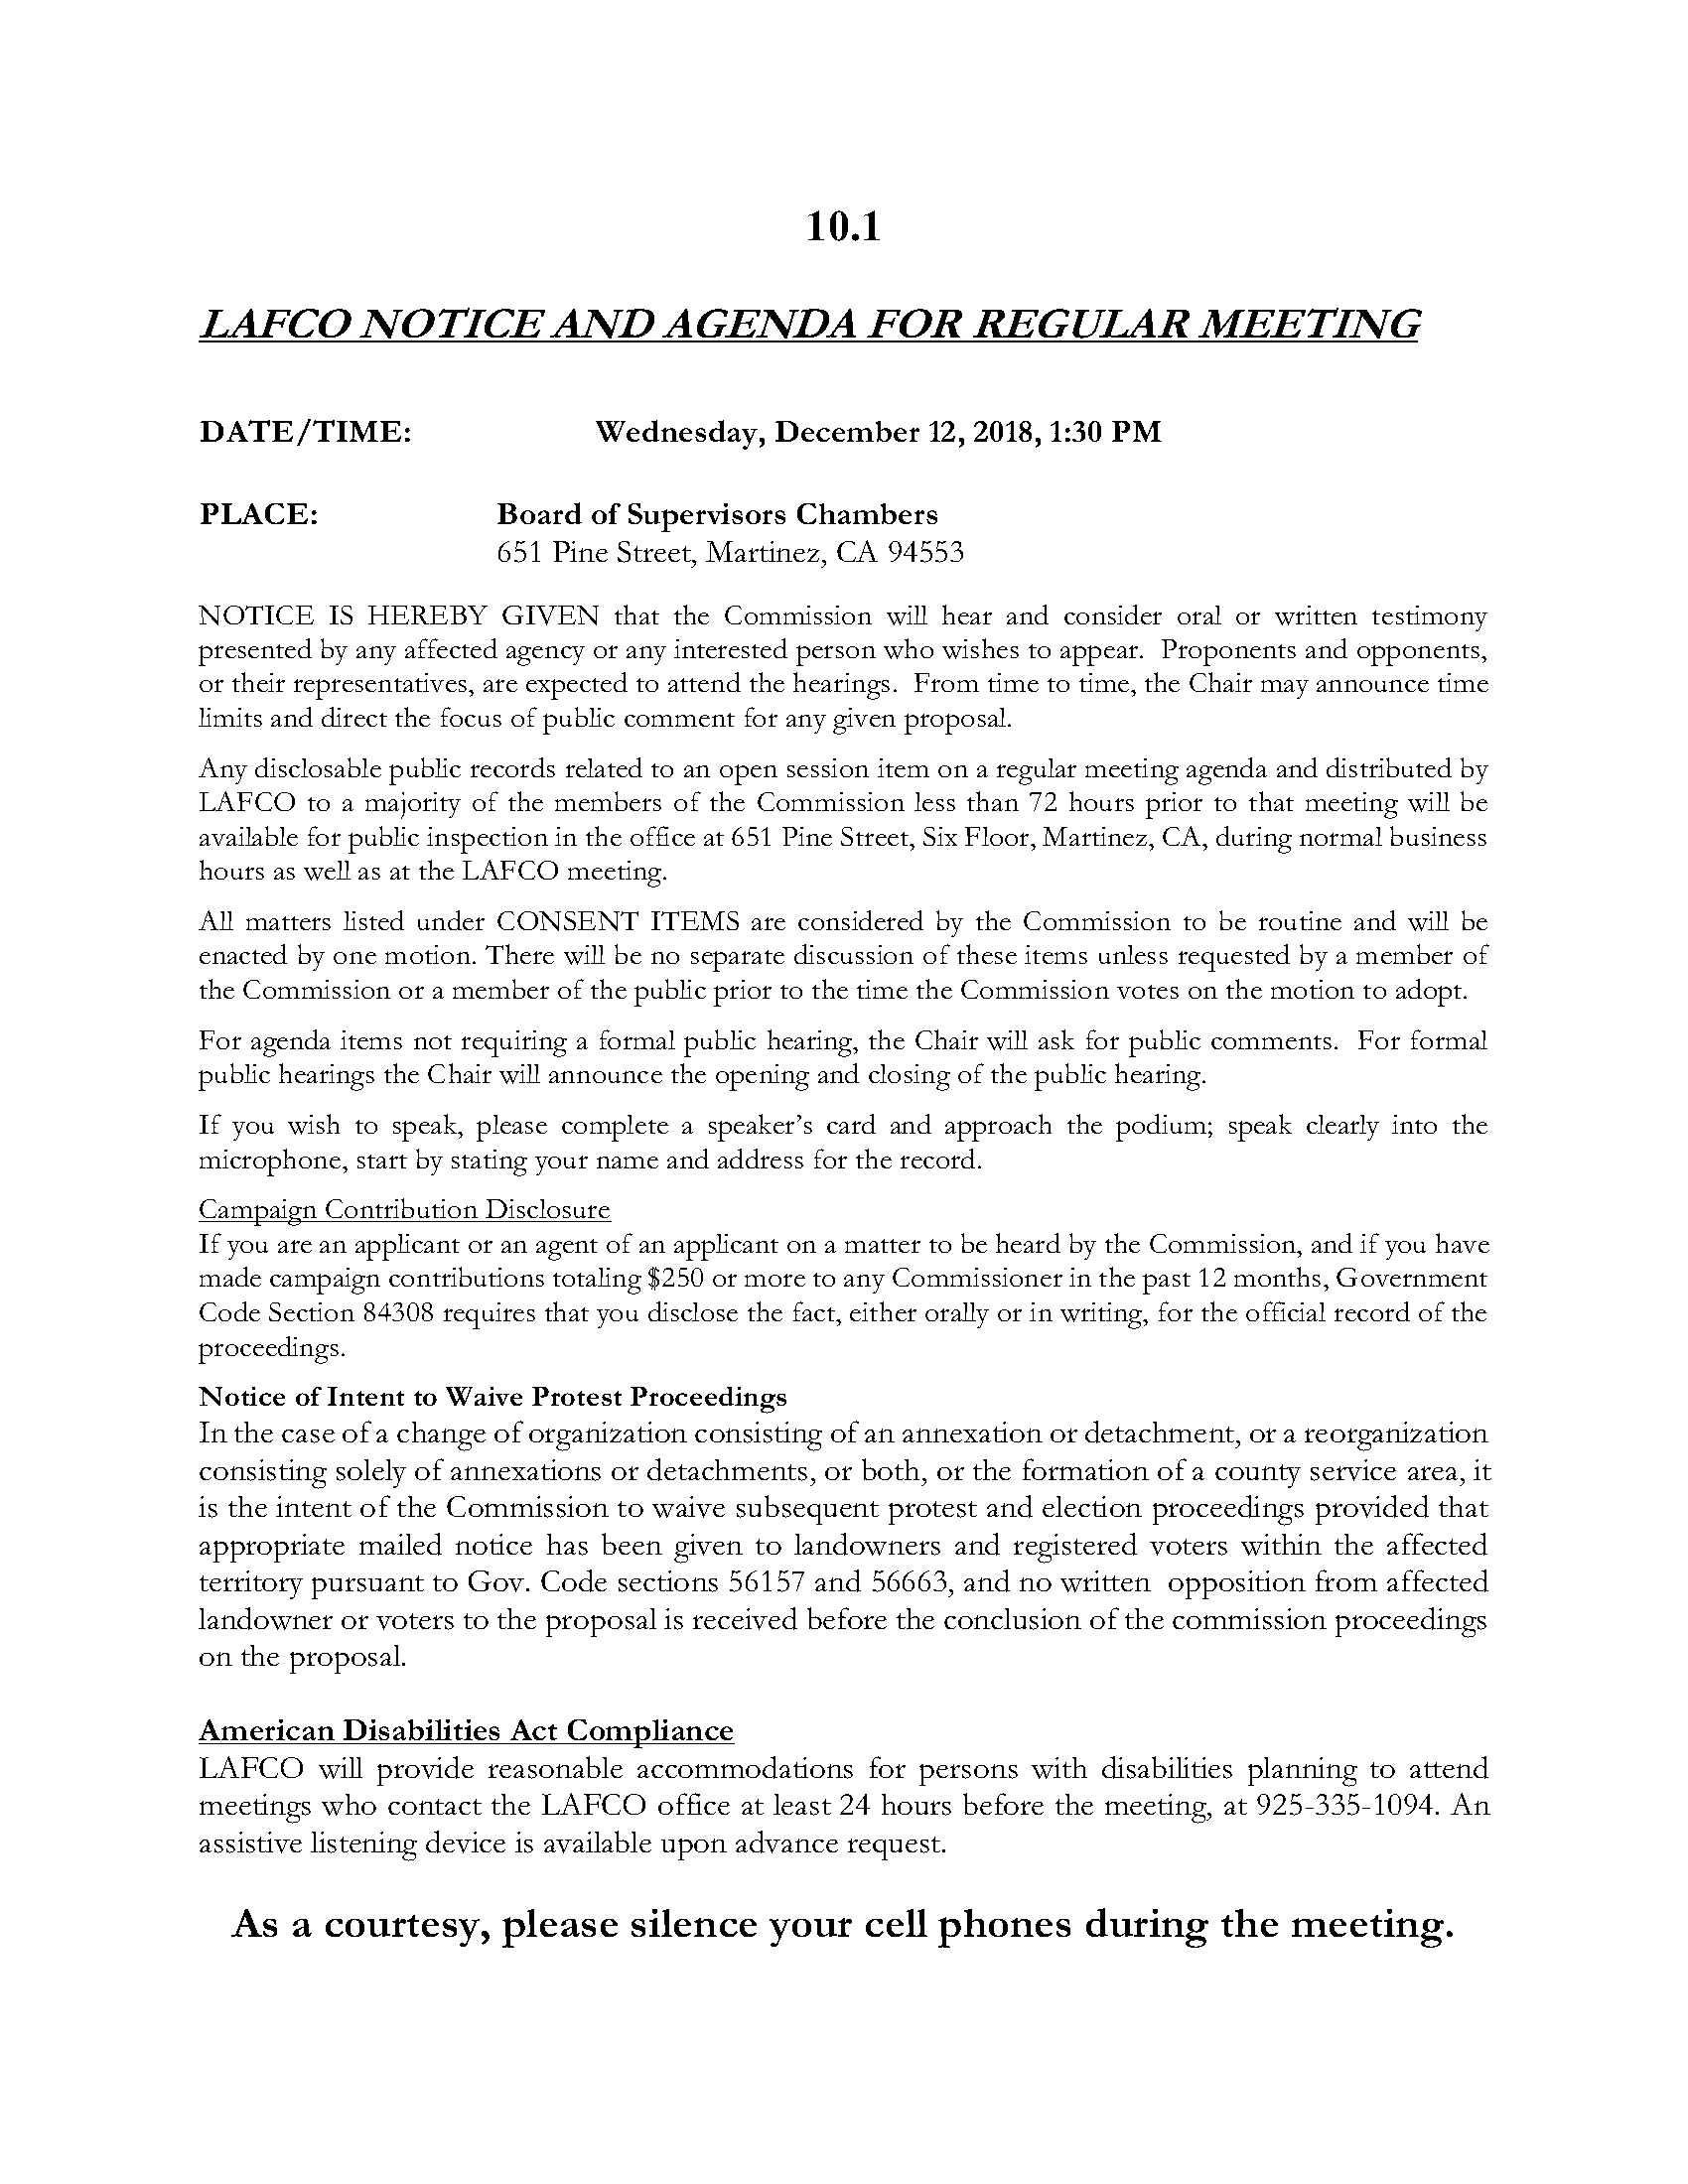 ESMAC Agenda 12.13.2018 (51 Pages)_26.jpg